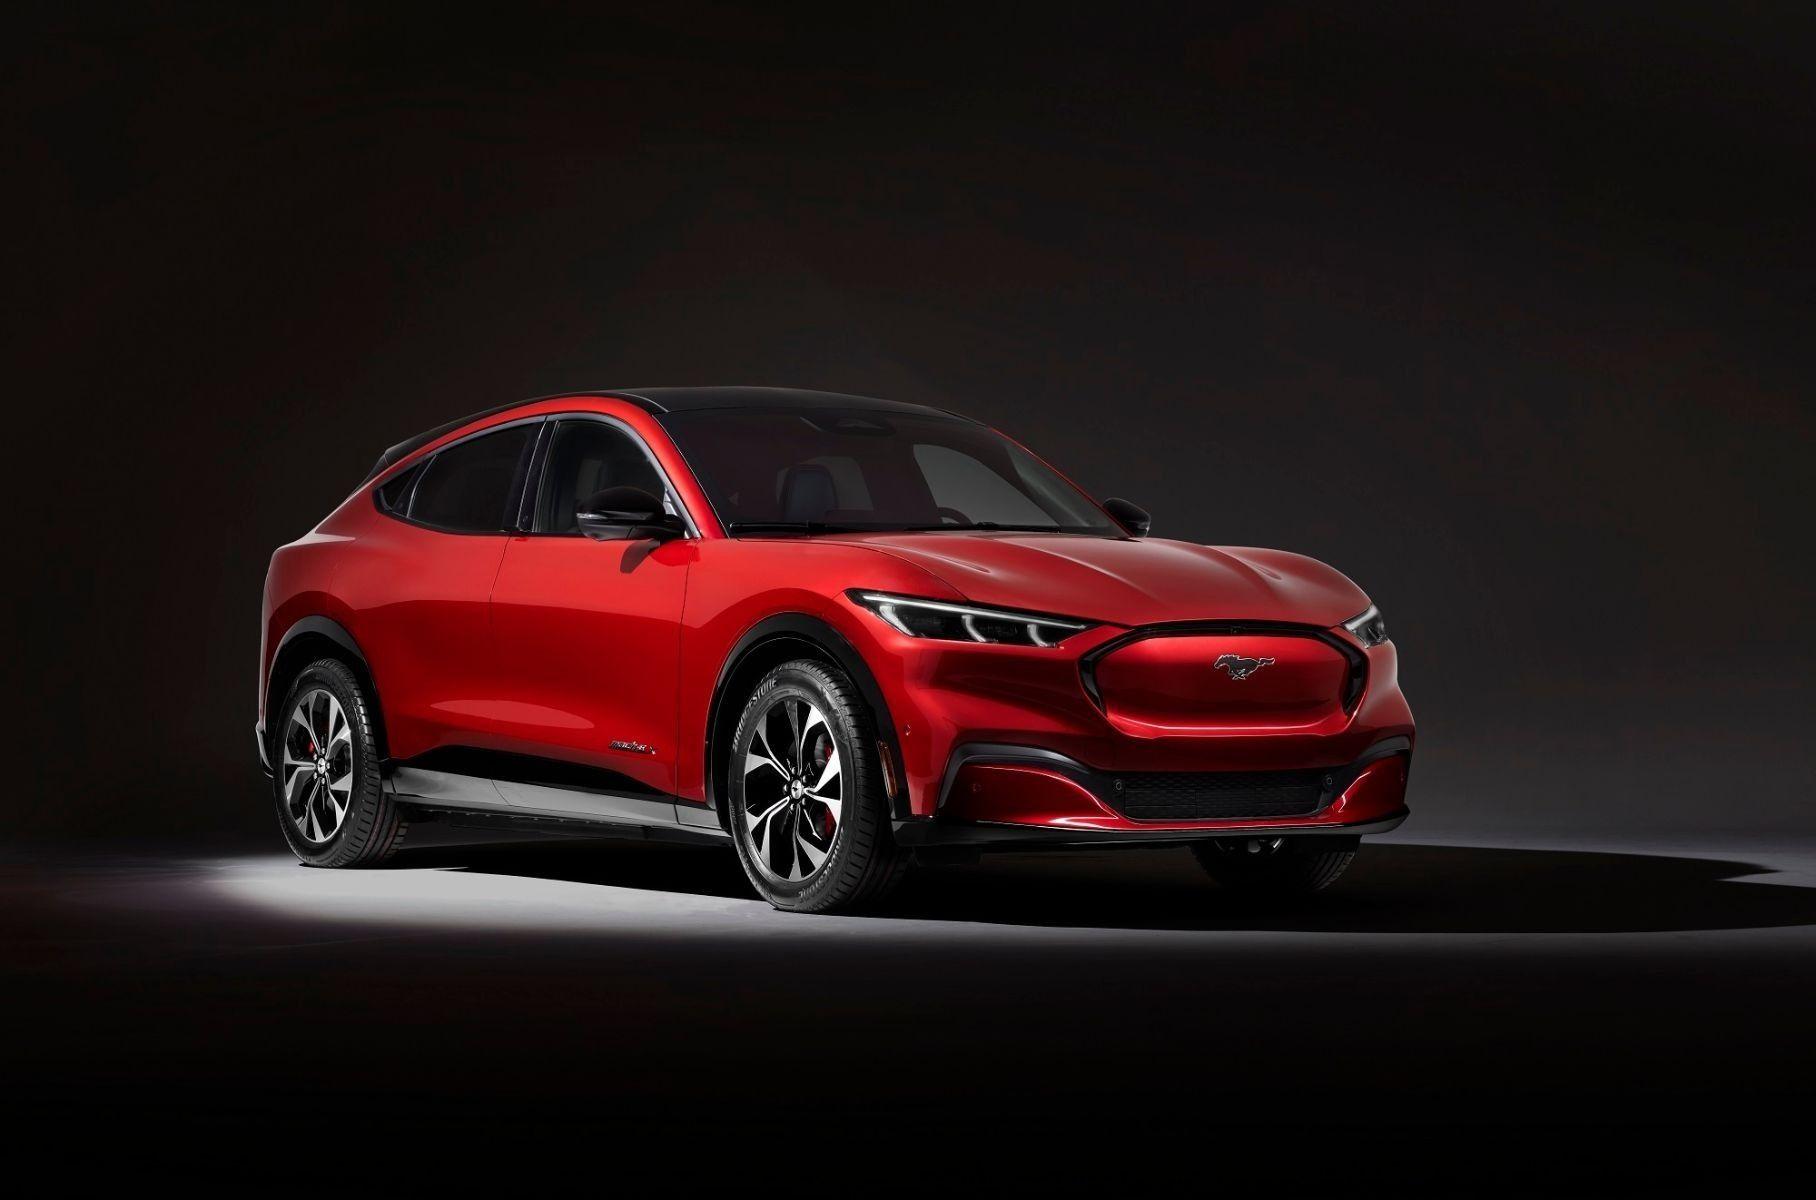 Ford развеял нашумевшие слухи о новом Mustang 1